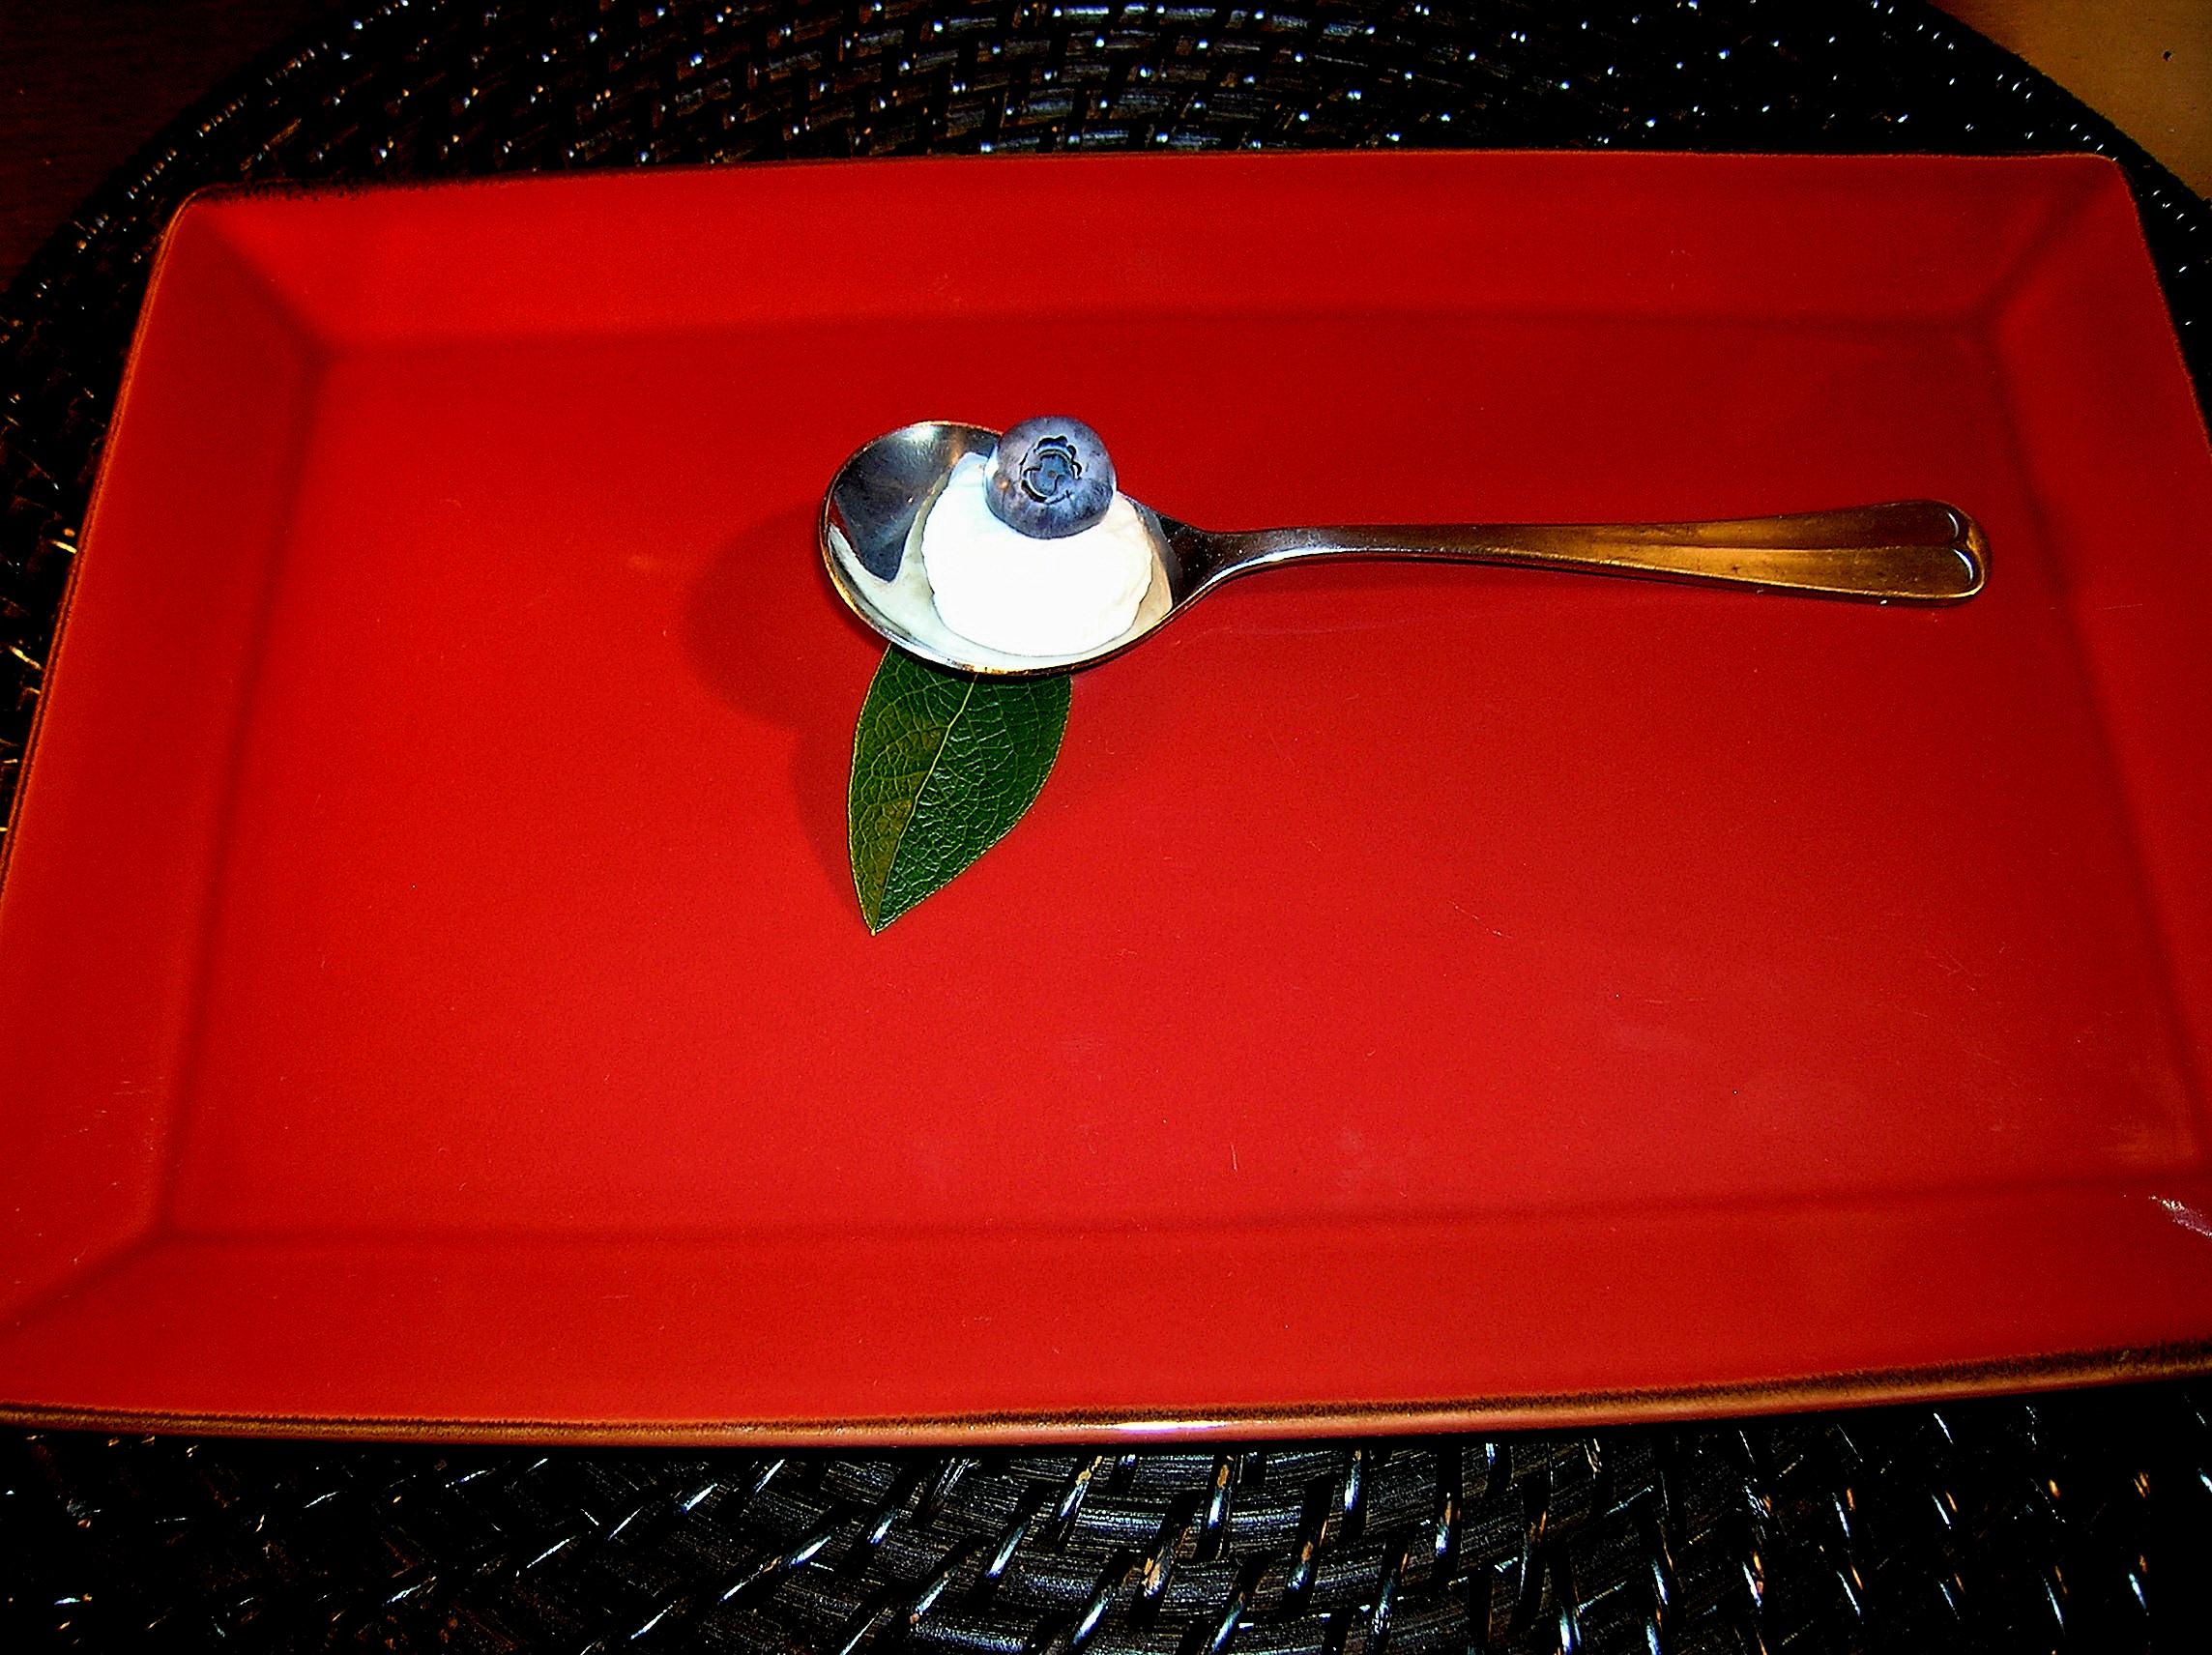 spoon blueberry